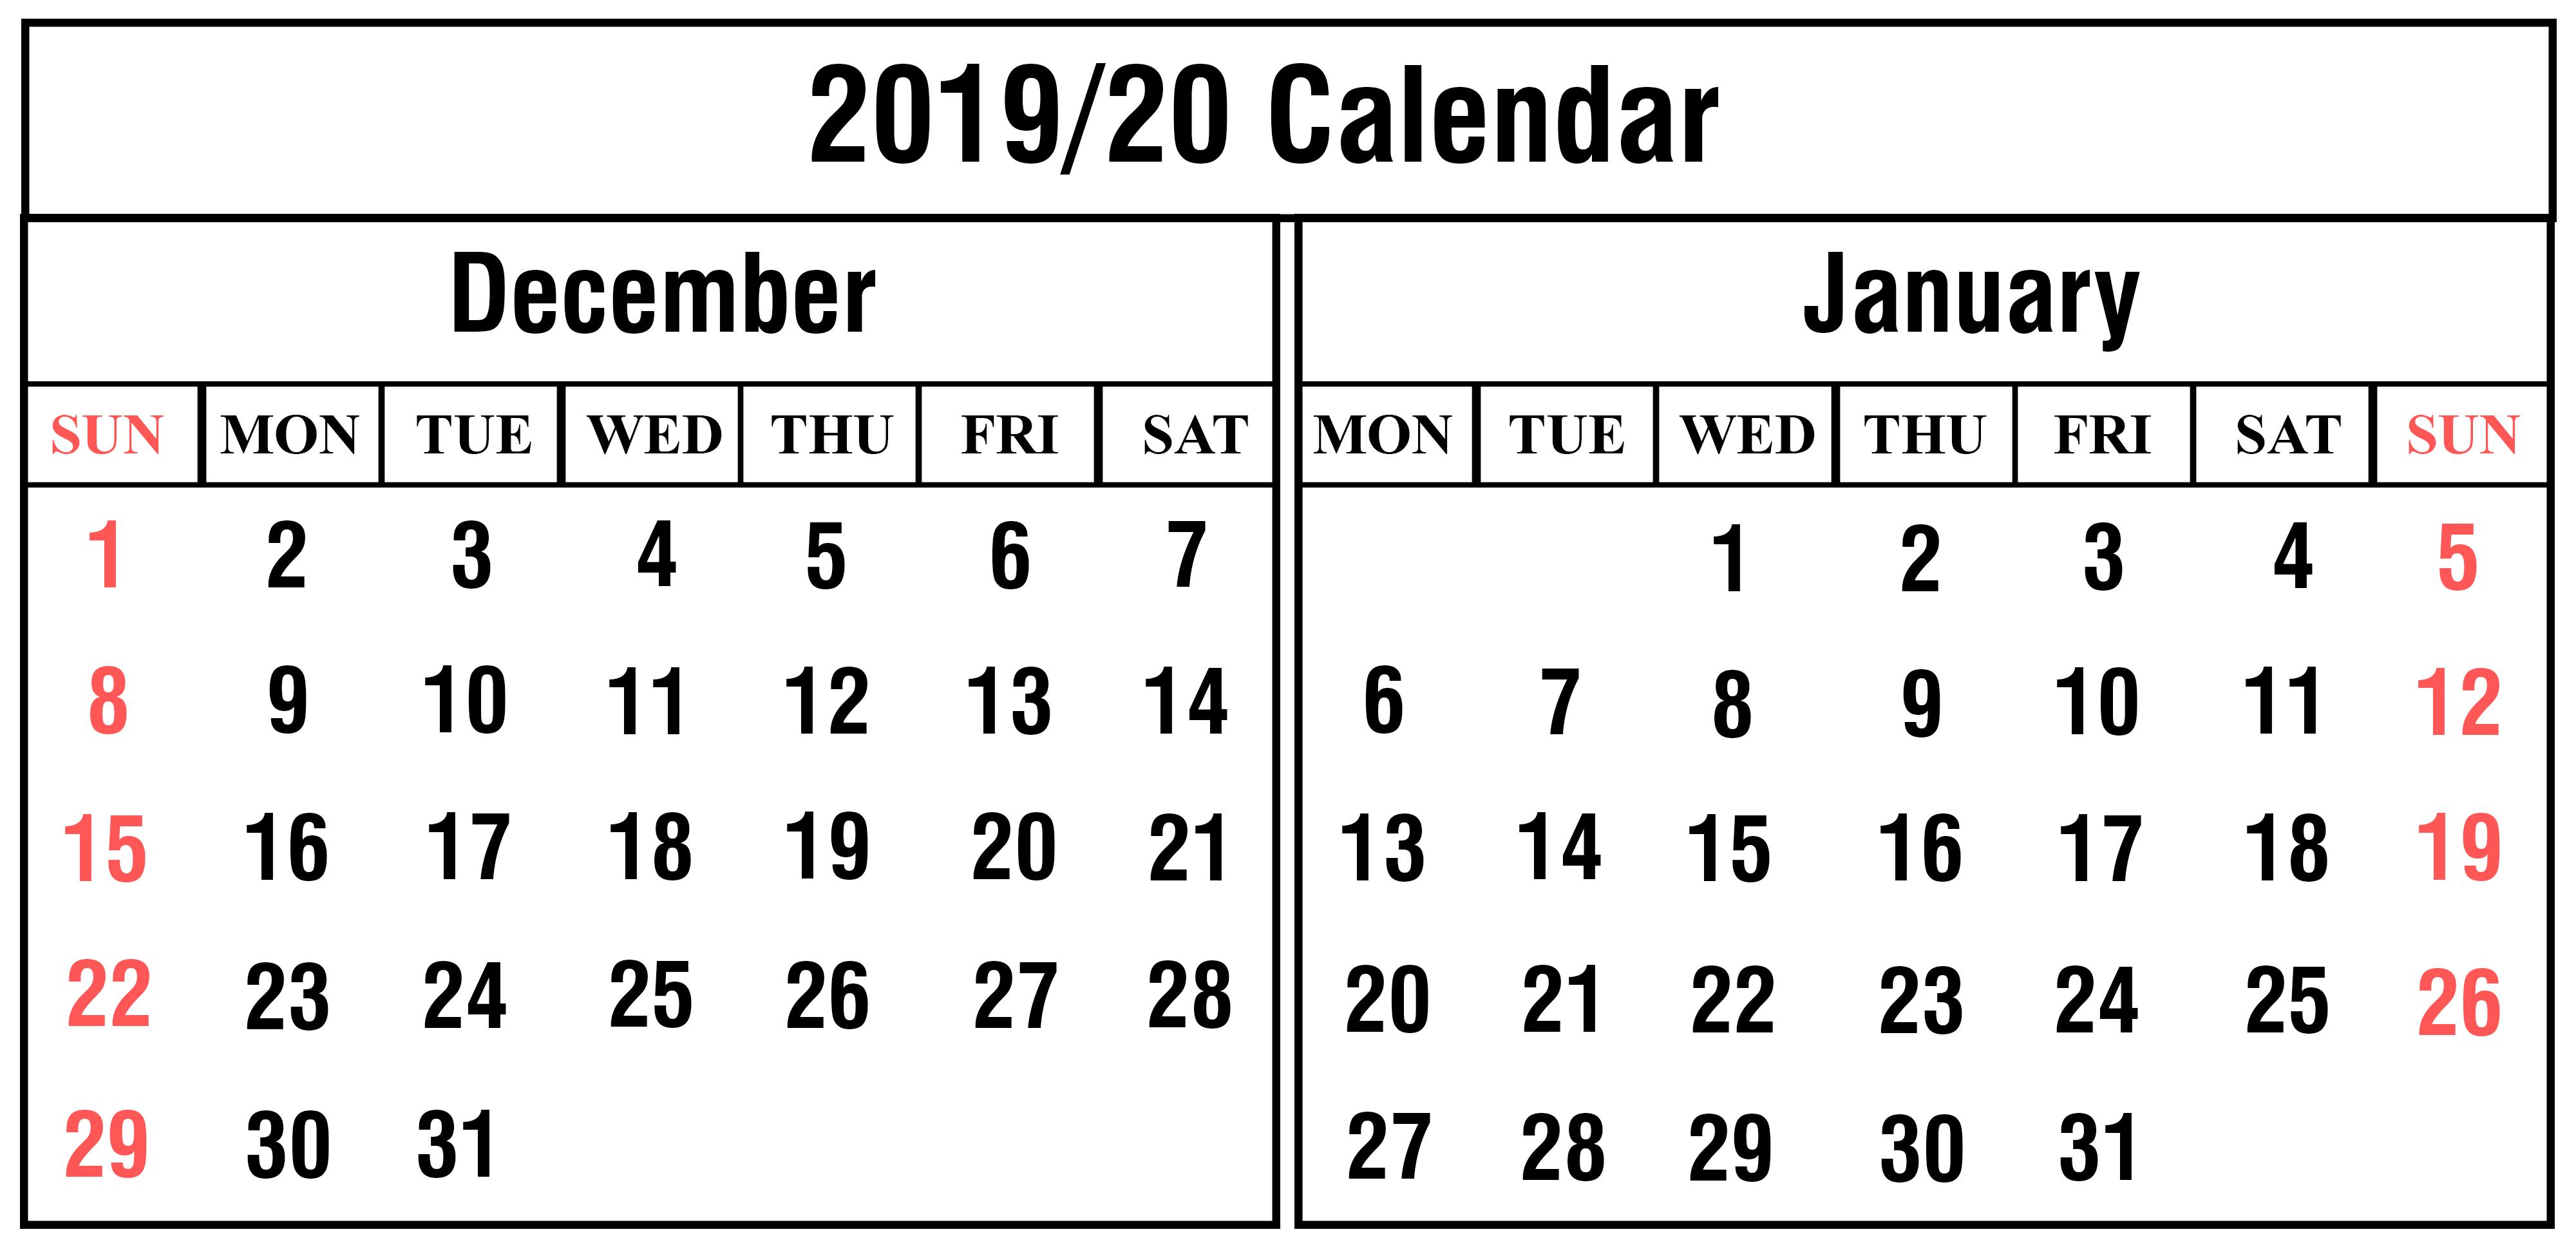 Blank December And January 2019-2020 Calendar Printable | Printable for Edit Free Calendar Template 2019-2020